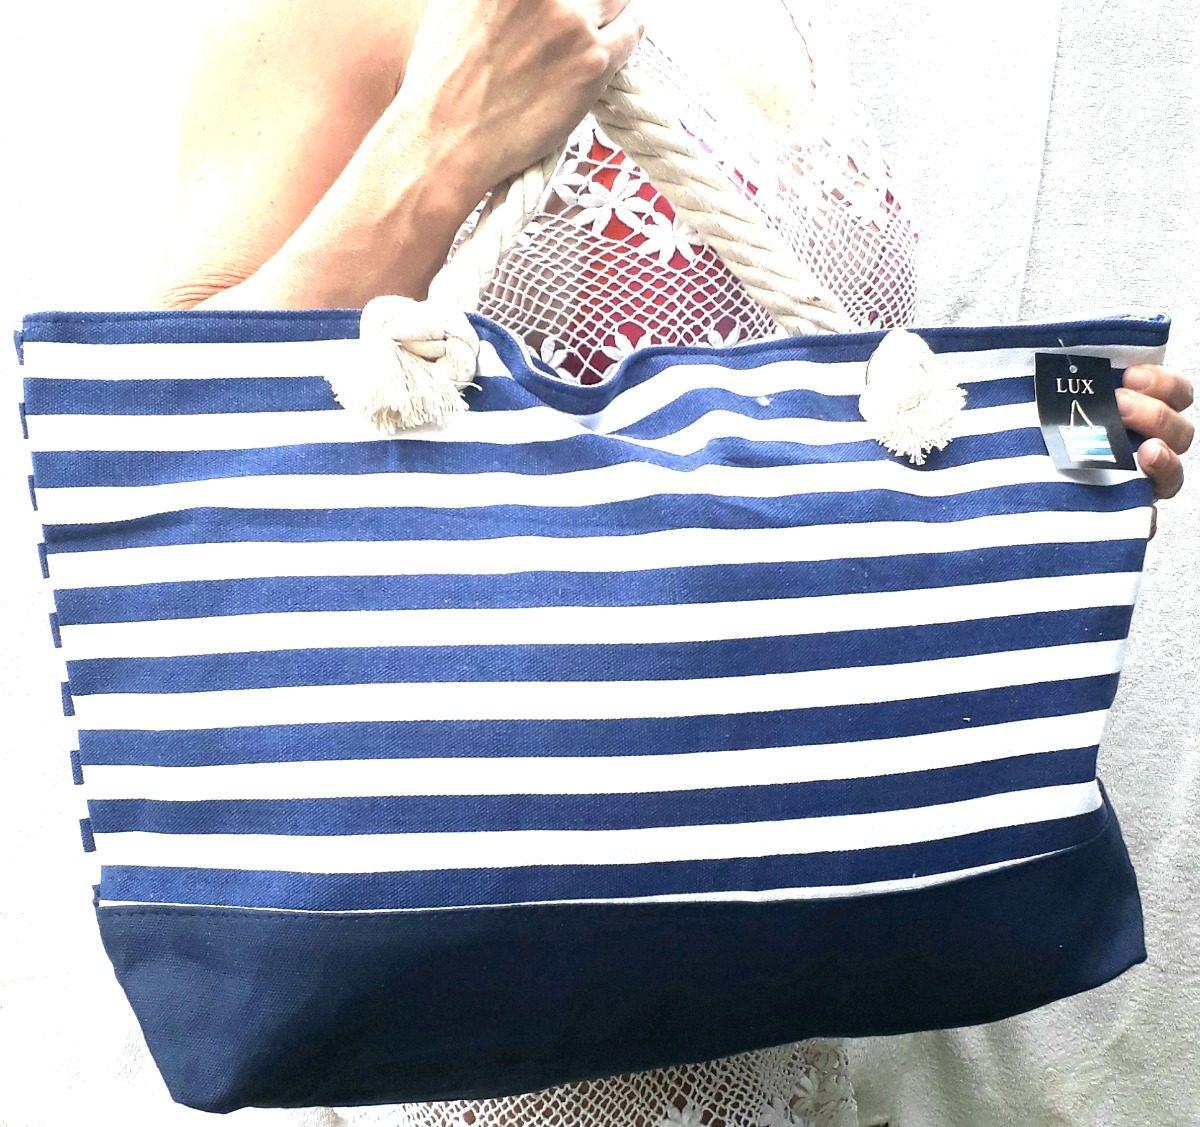 cc7c89828 bolsa praia grande listrada azul branco alça de ombro corda. Carregando  zoom.